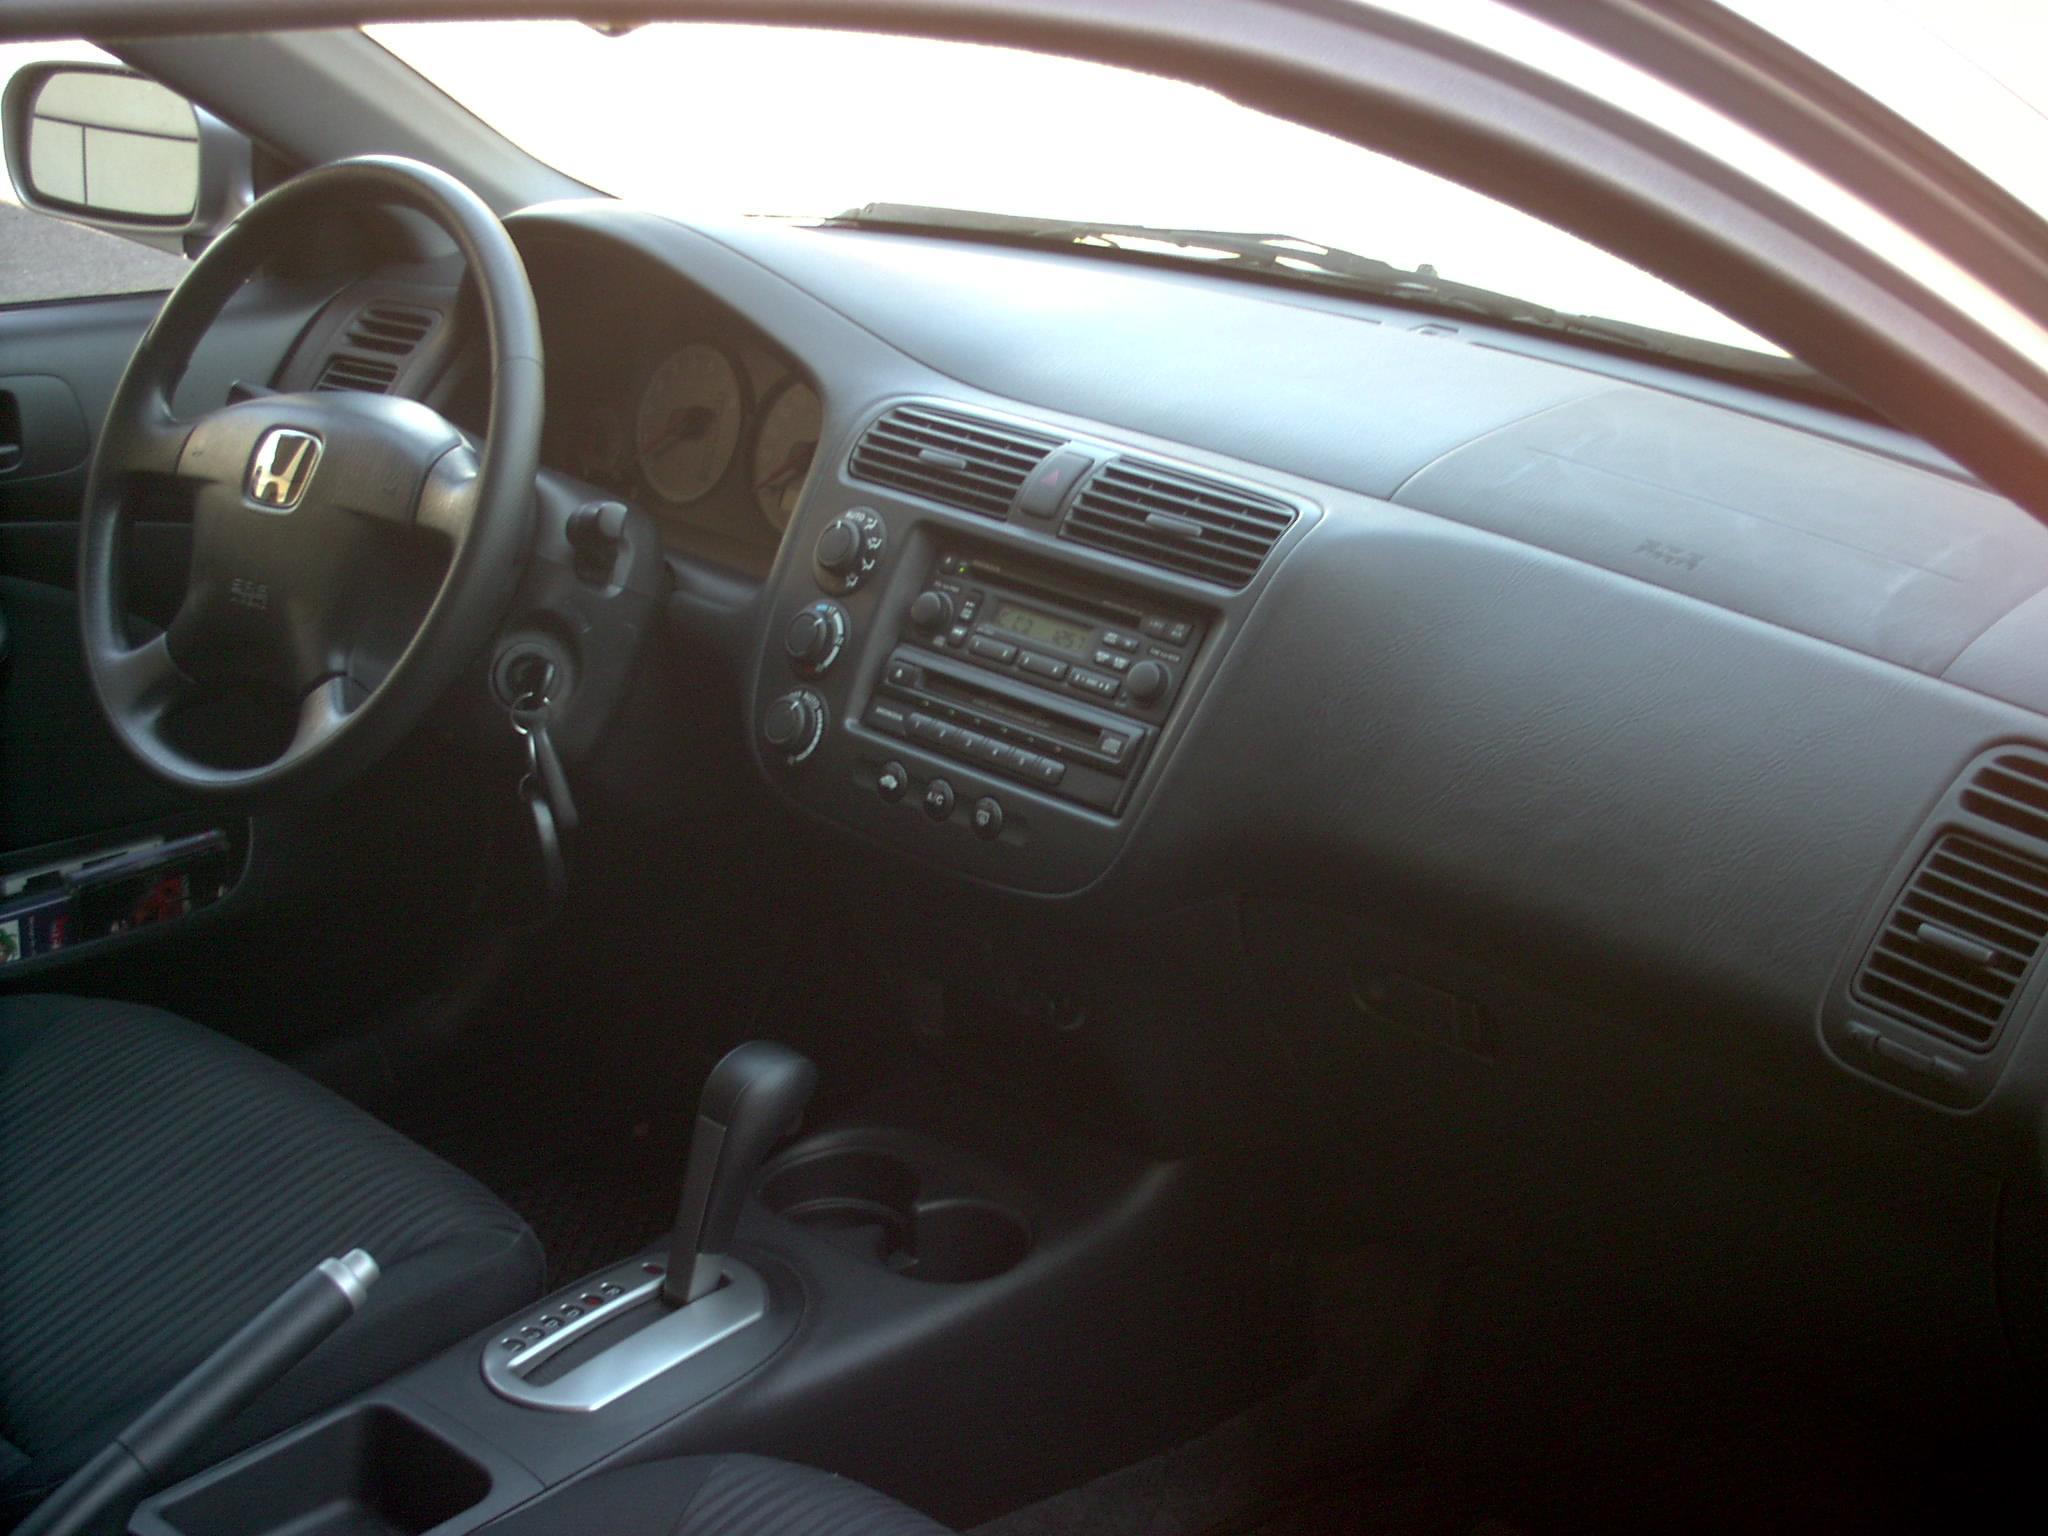 Honda civic vii wn trze